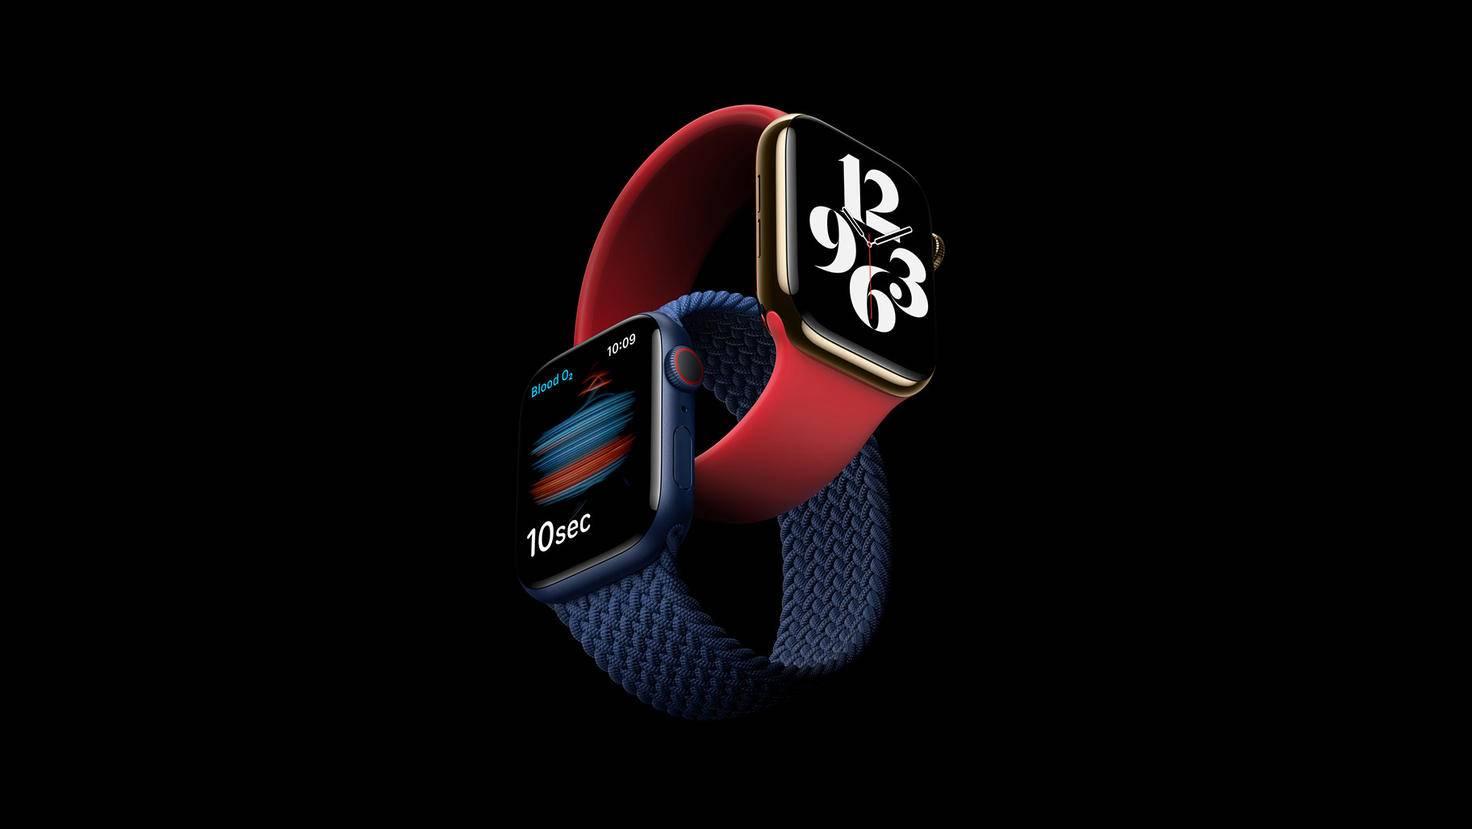 apple-watch-series-6-5